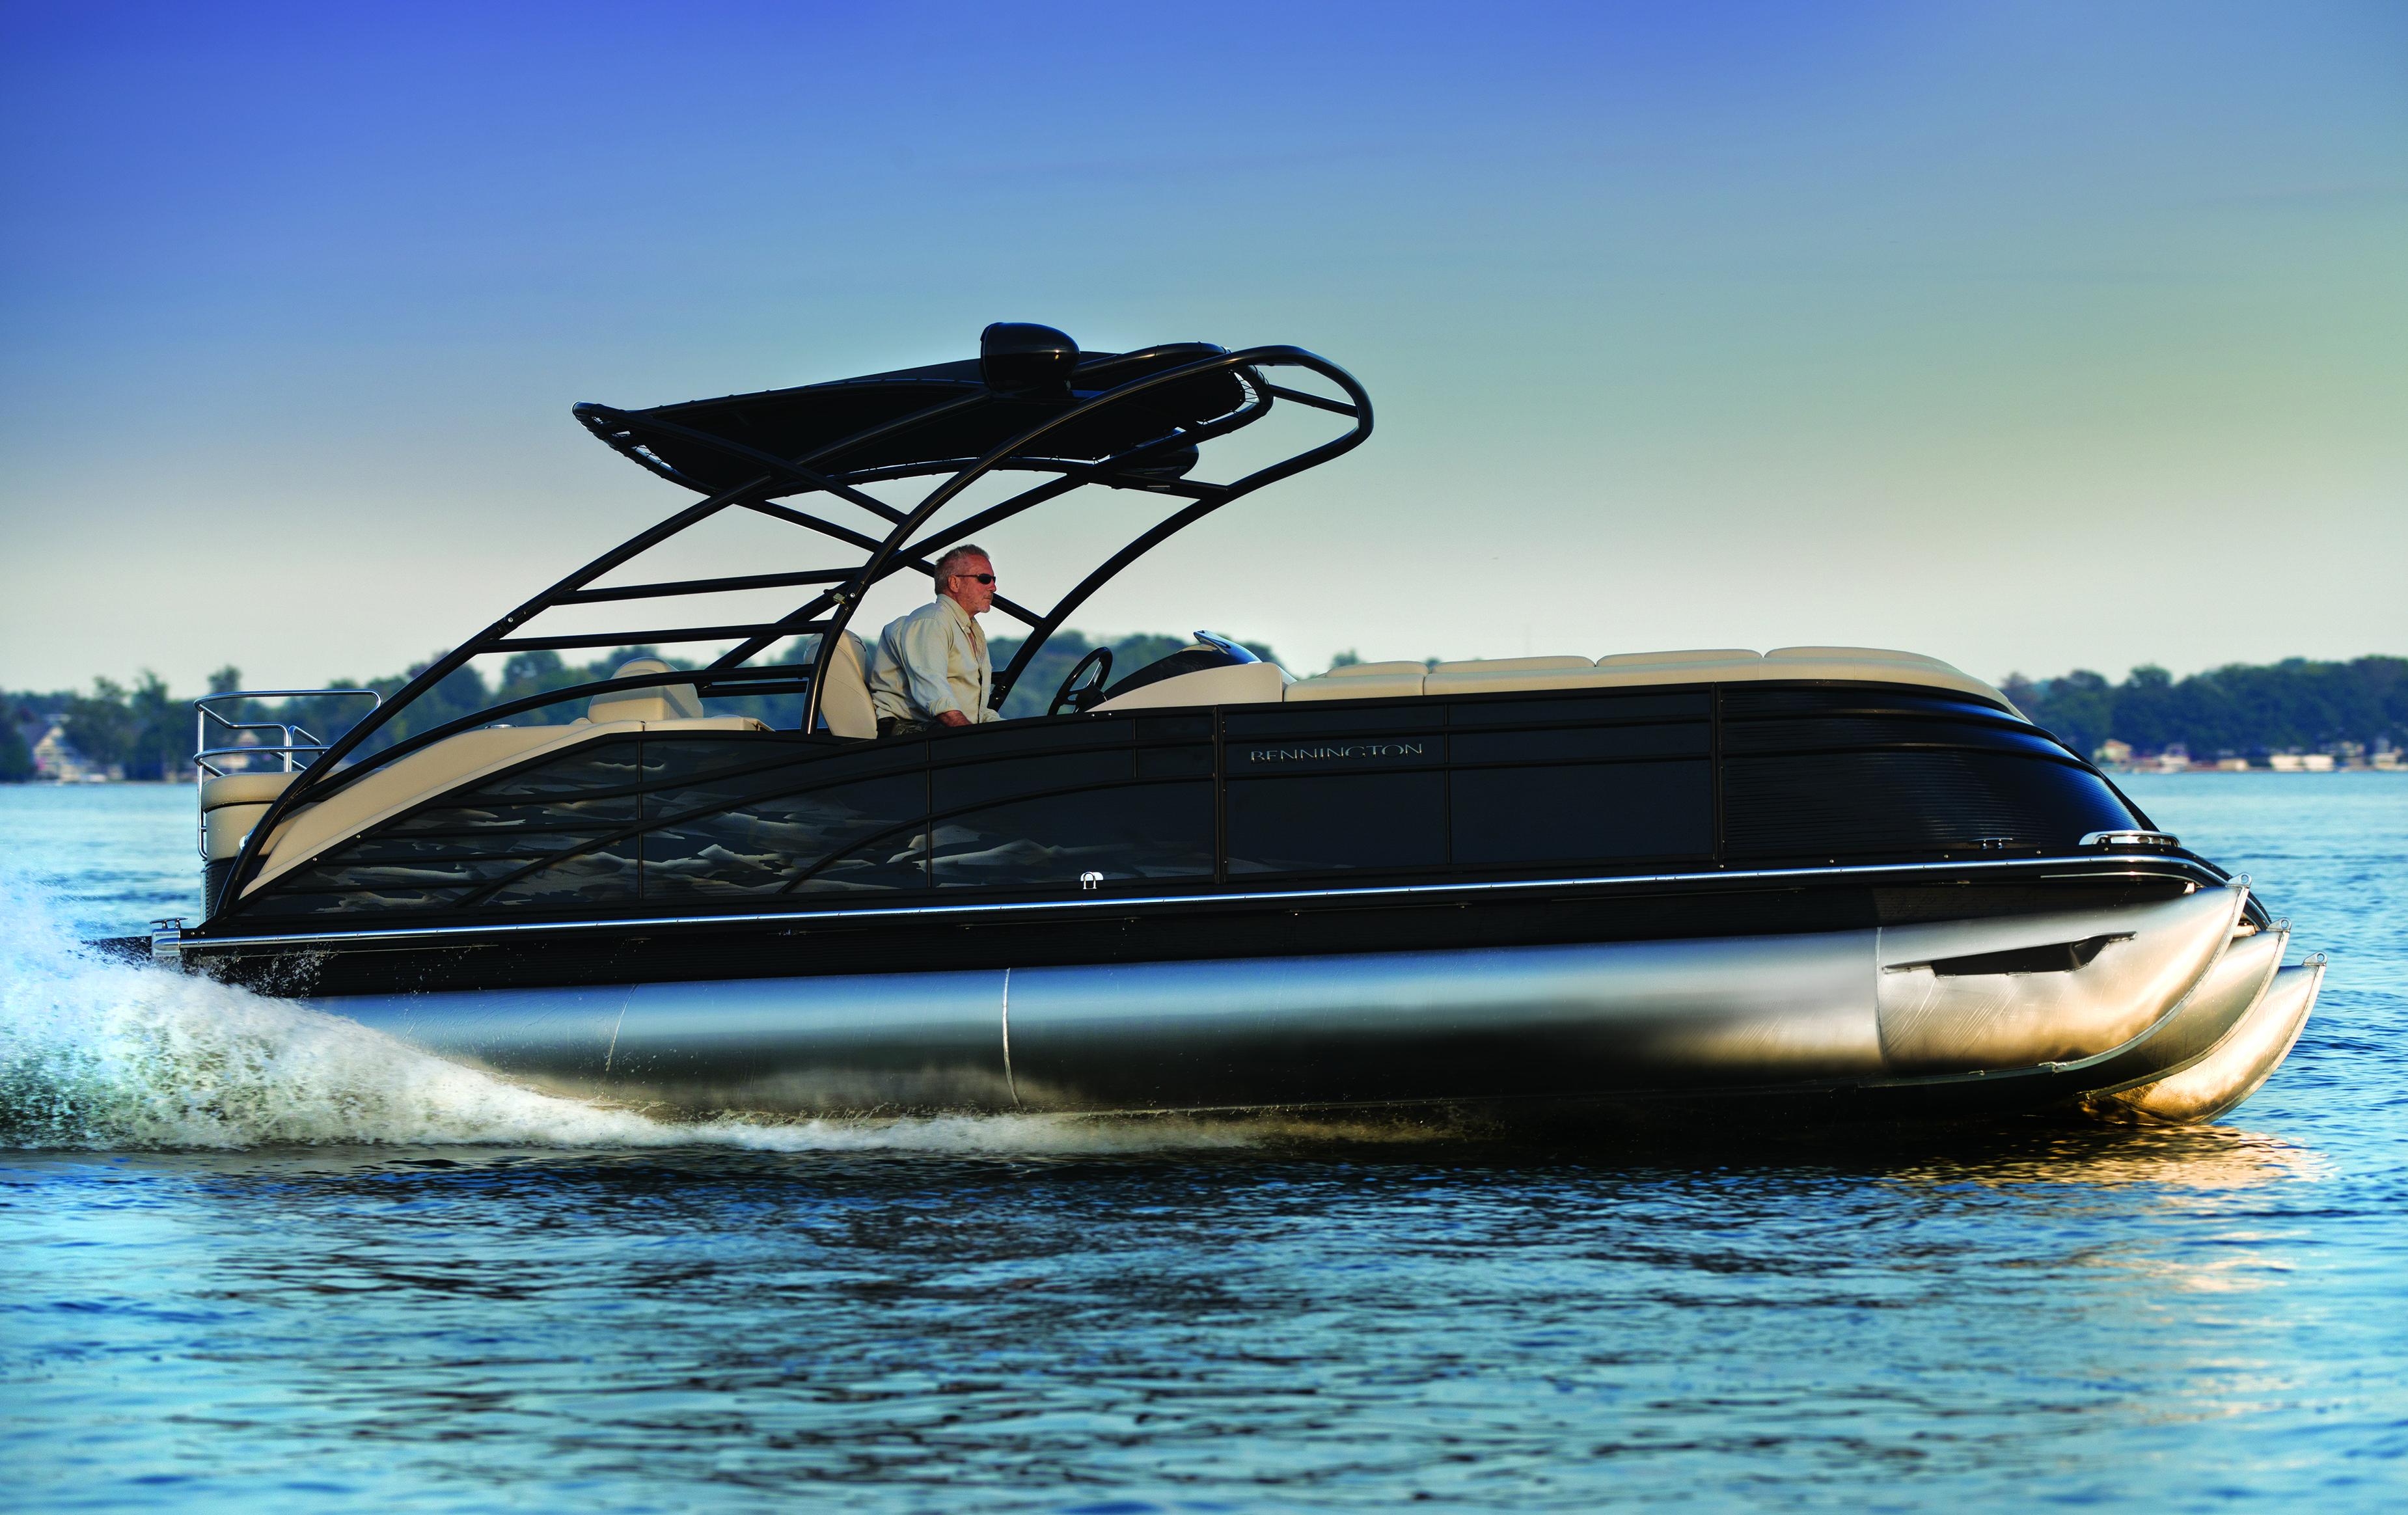 The 2014 Bennington Blackout Edition Pontoon Boat Is Sleek